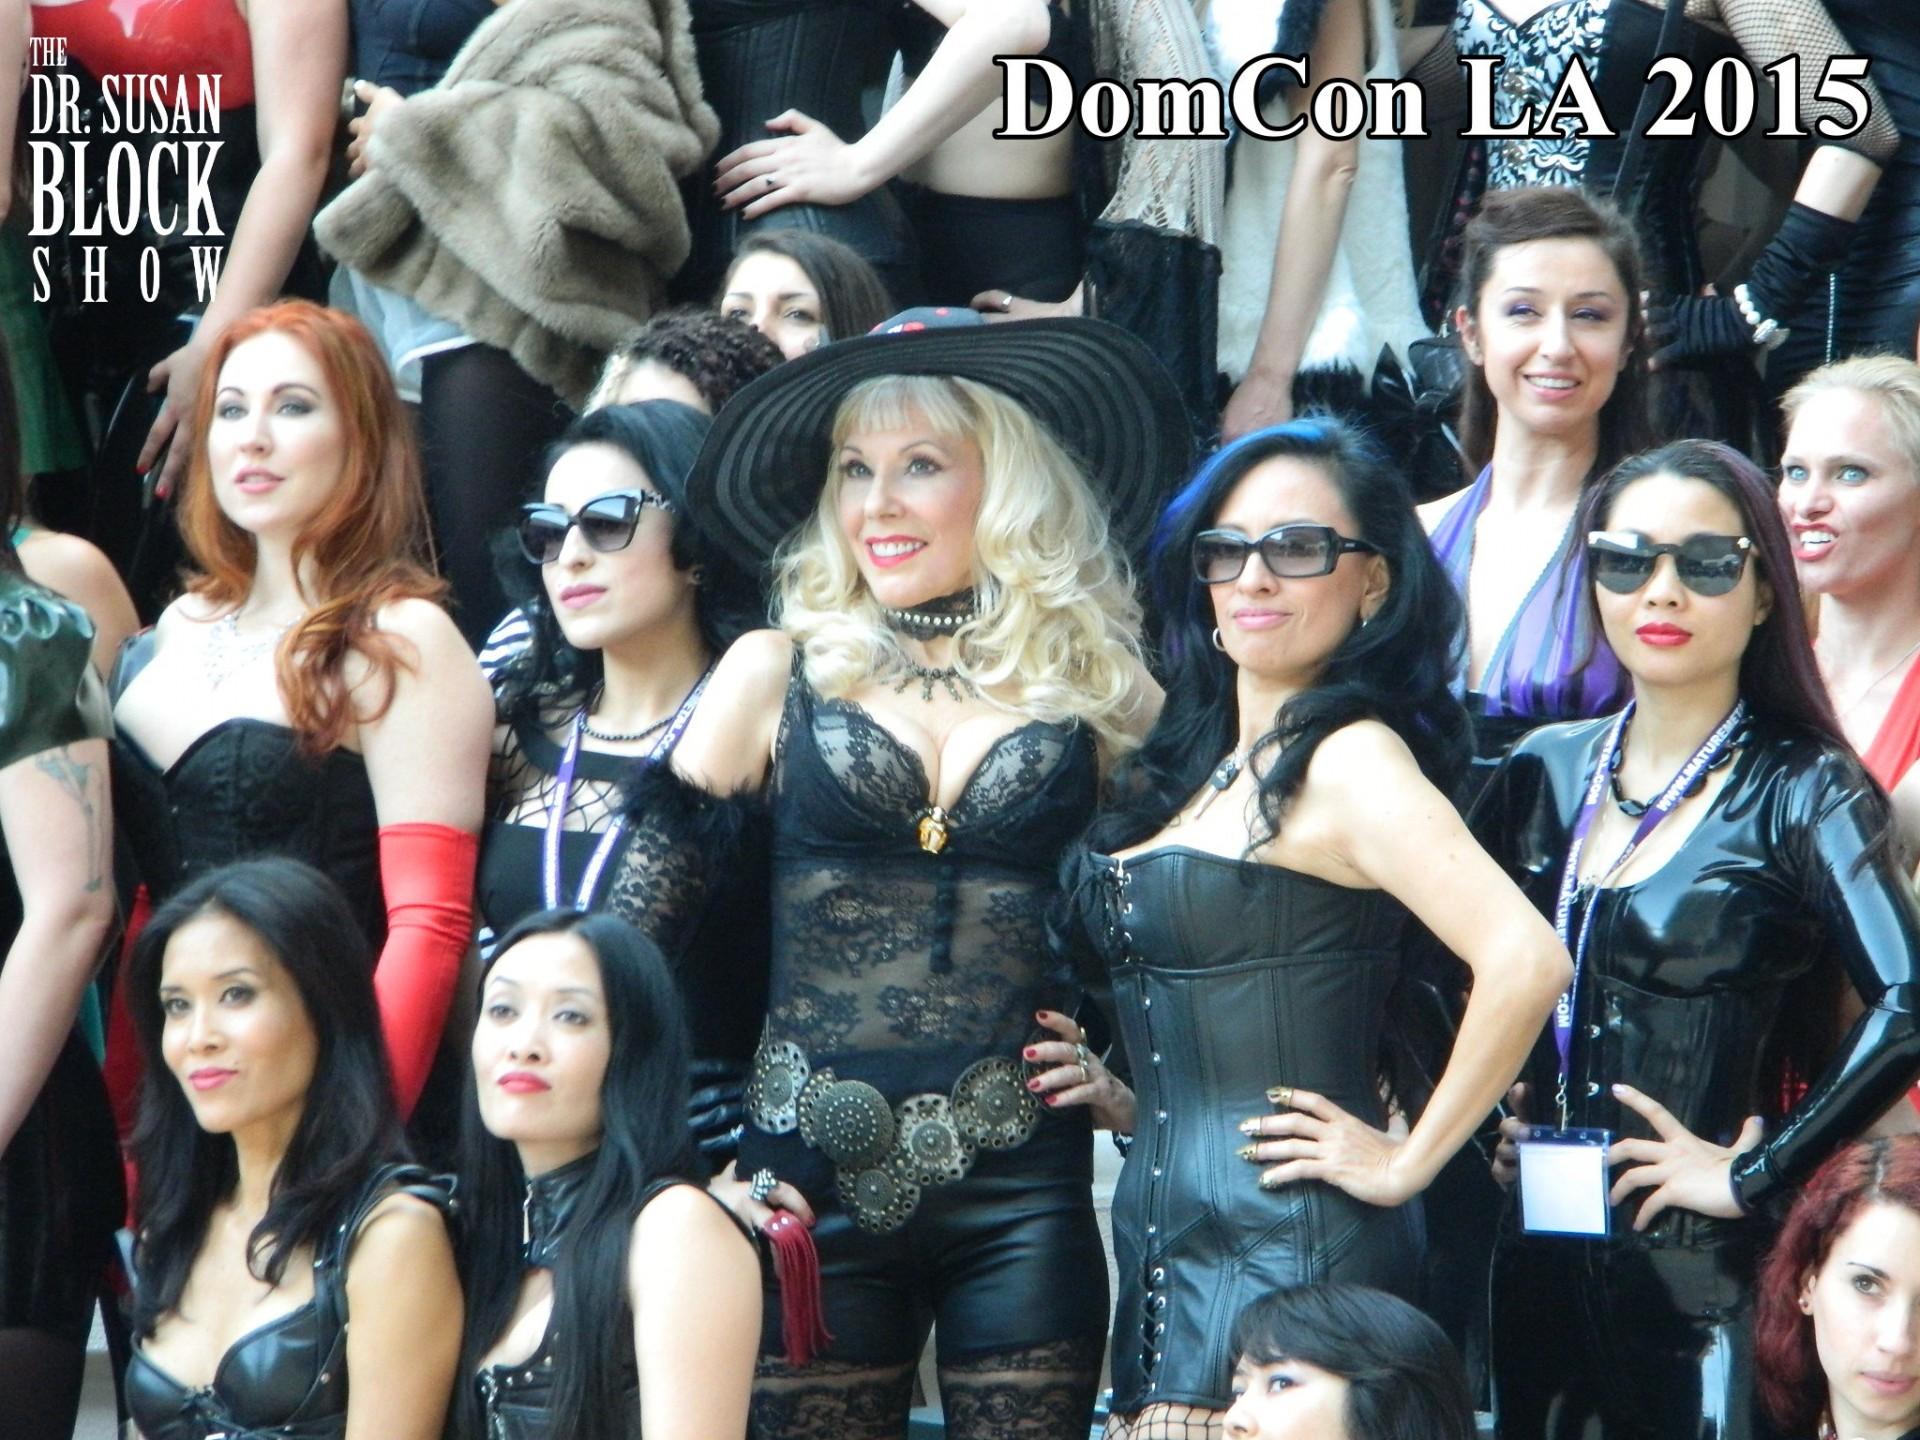 DomCon LA 2015